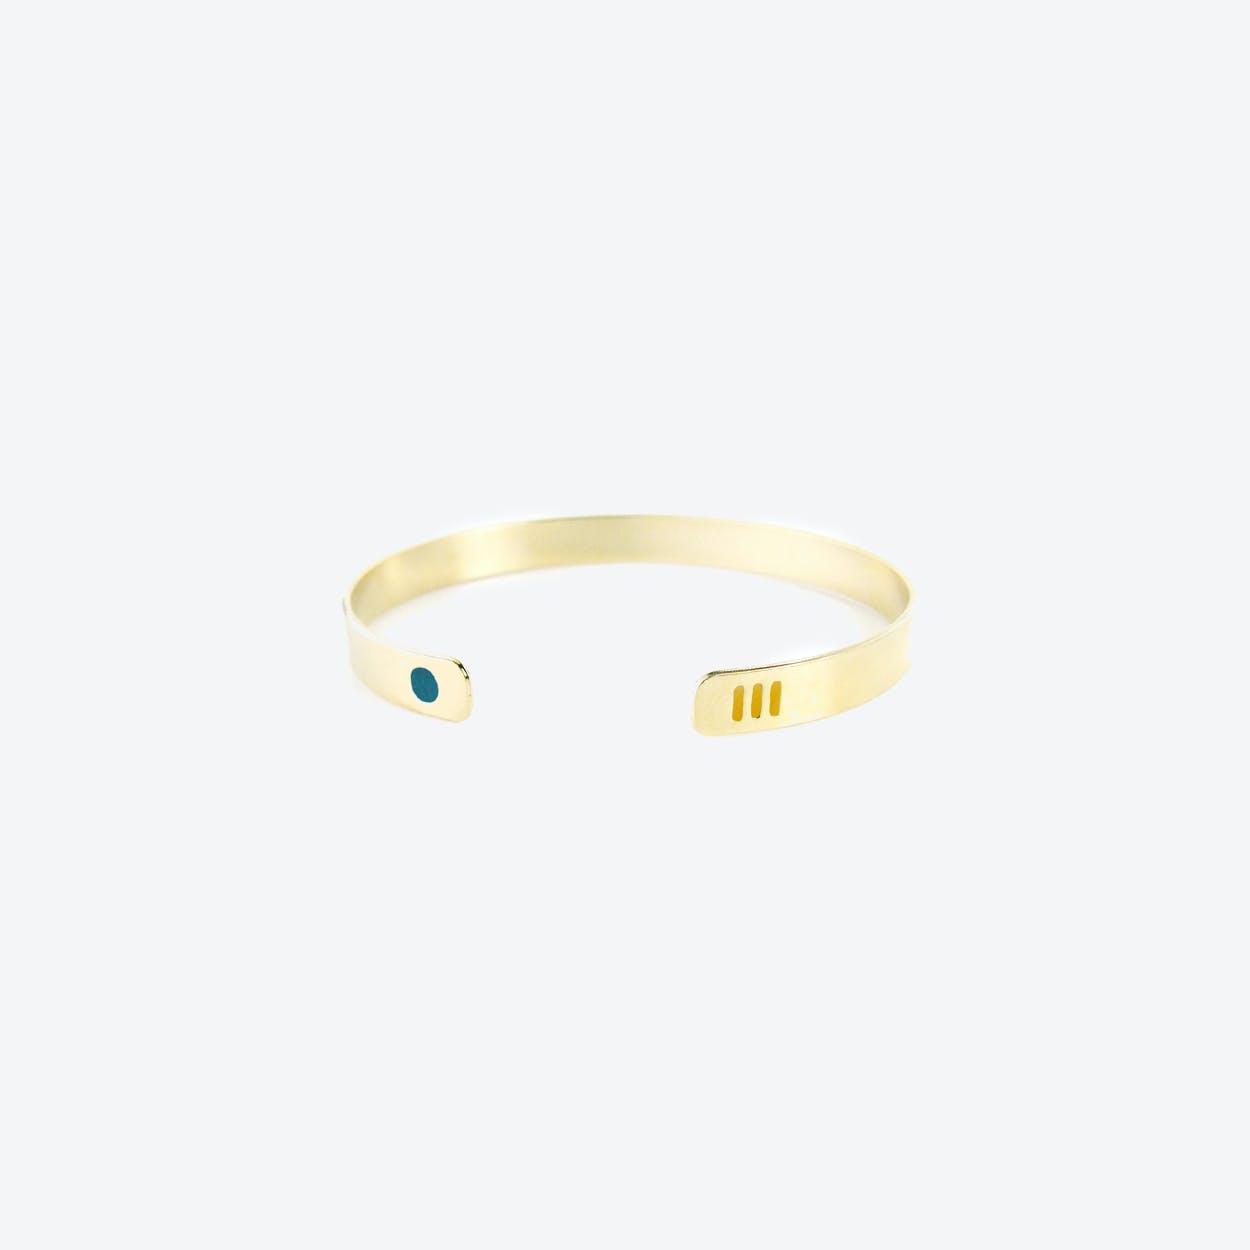 Miami Bracelet - Emerald & Saffron